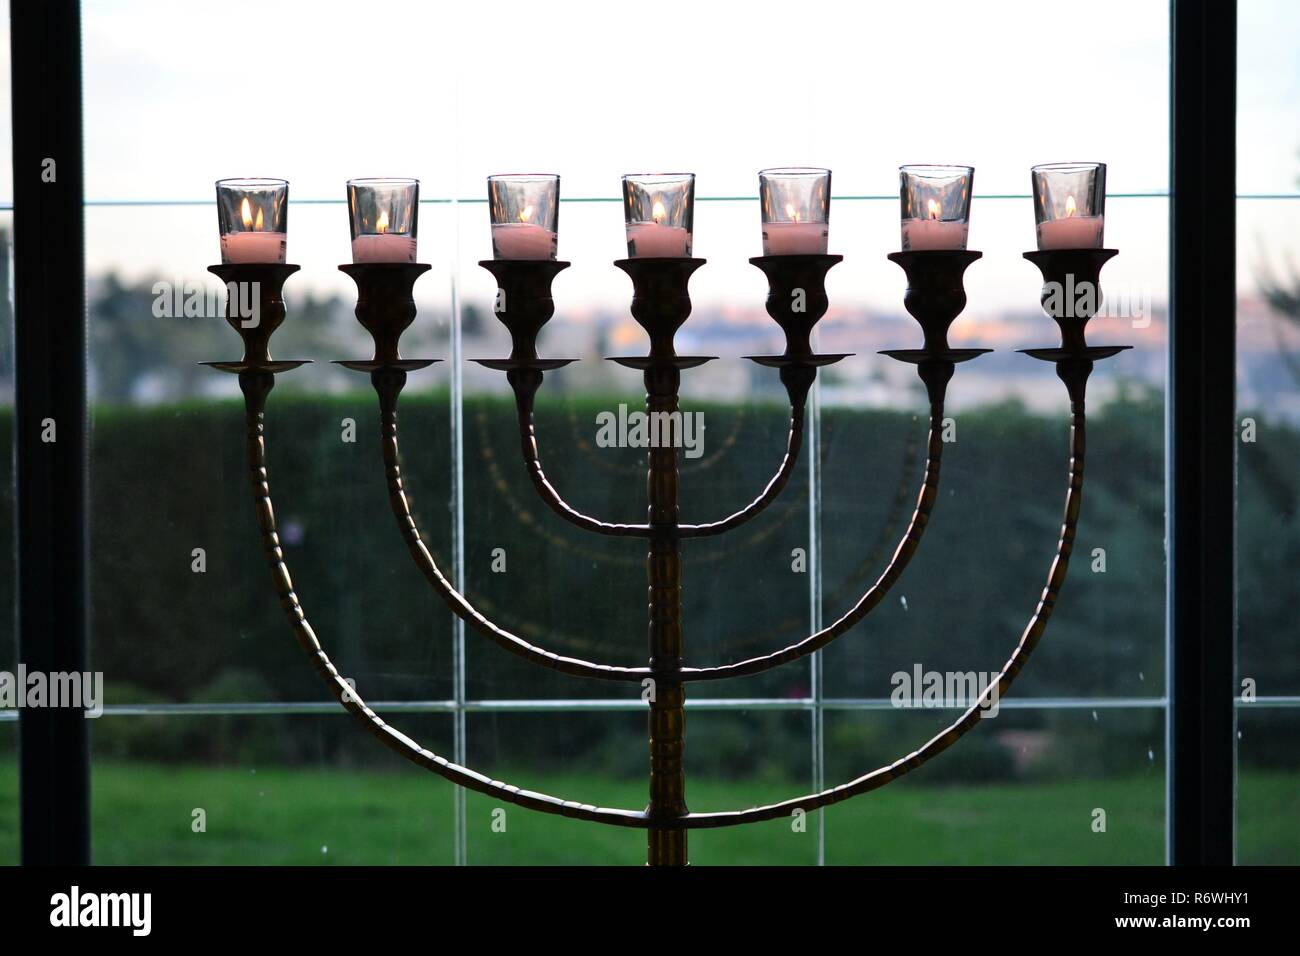 beautiful Menorah jewish 7 armed lampstand standing in window, mount zion in background JERUSALEM ISRAEL - Stock Image